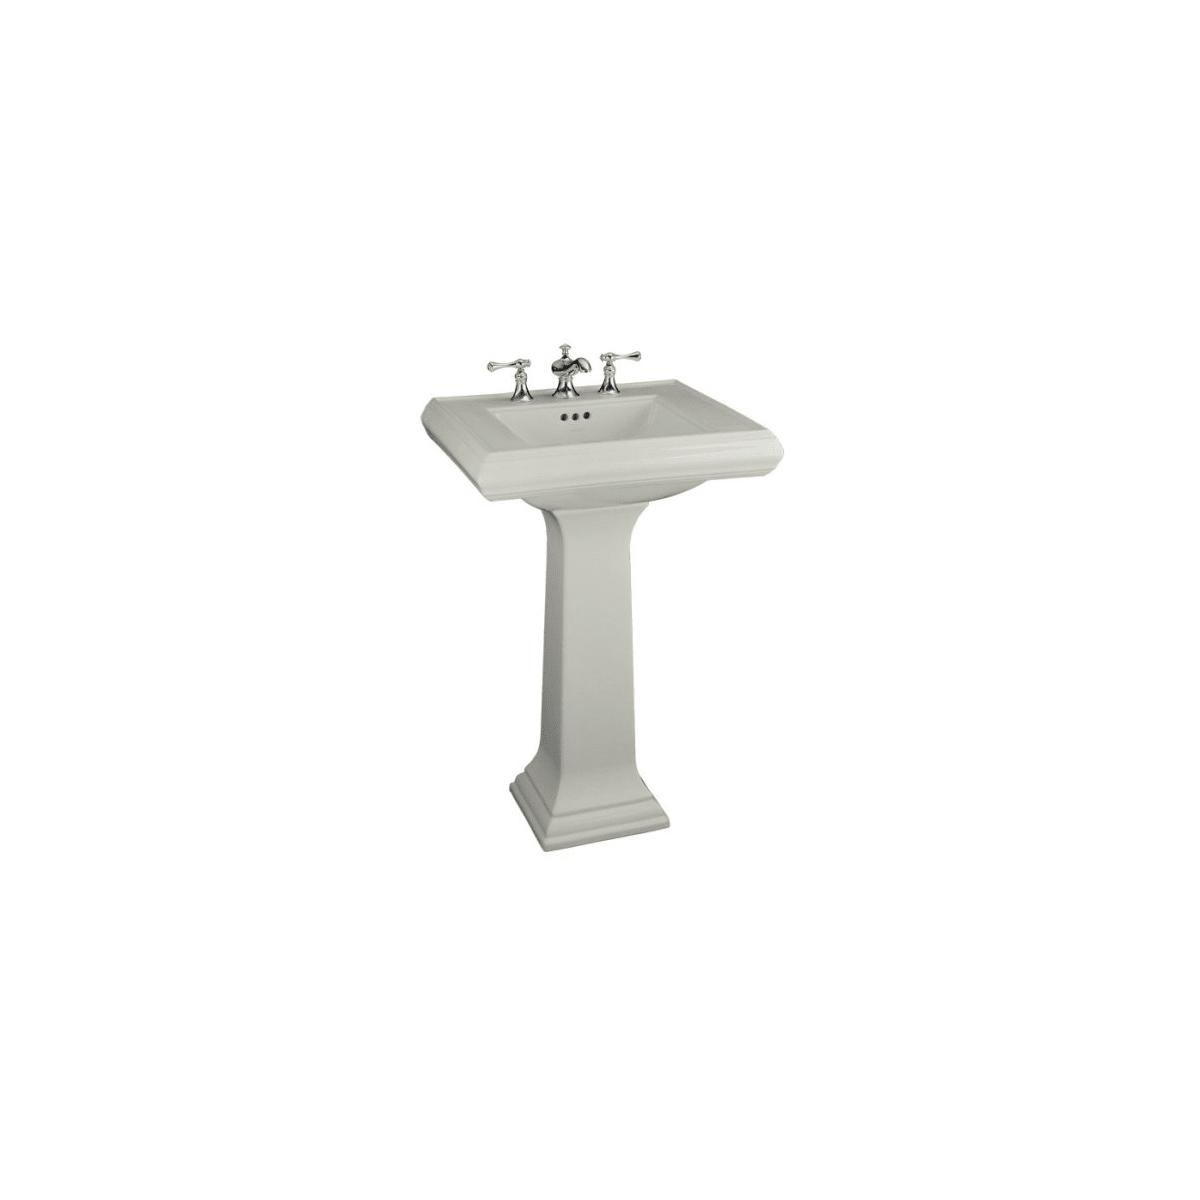 White KOHLER K-2238-4-0 Memoirs Pedestal Bathroom Sink with 4 Centers and Classic Design